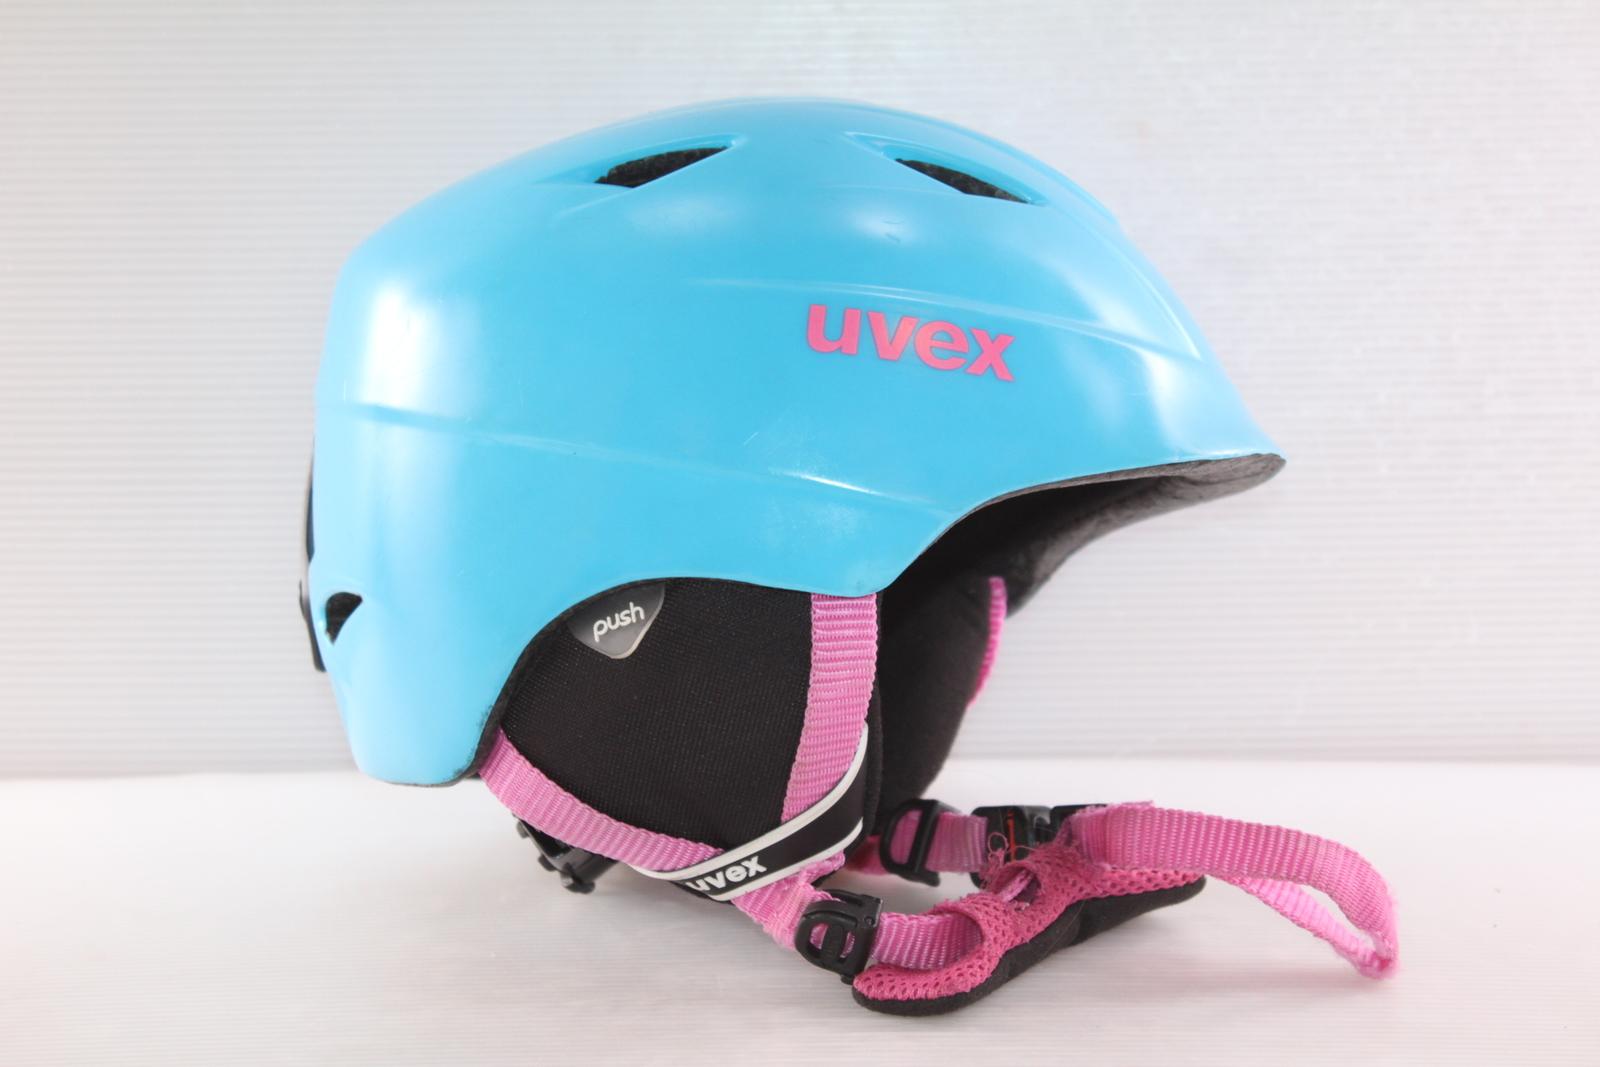 Dětská lyžařská helma Uvex Uvex - posuvná vel. 52 - 54